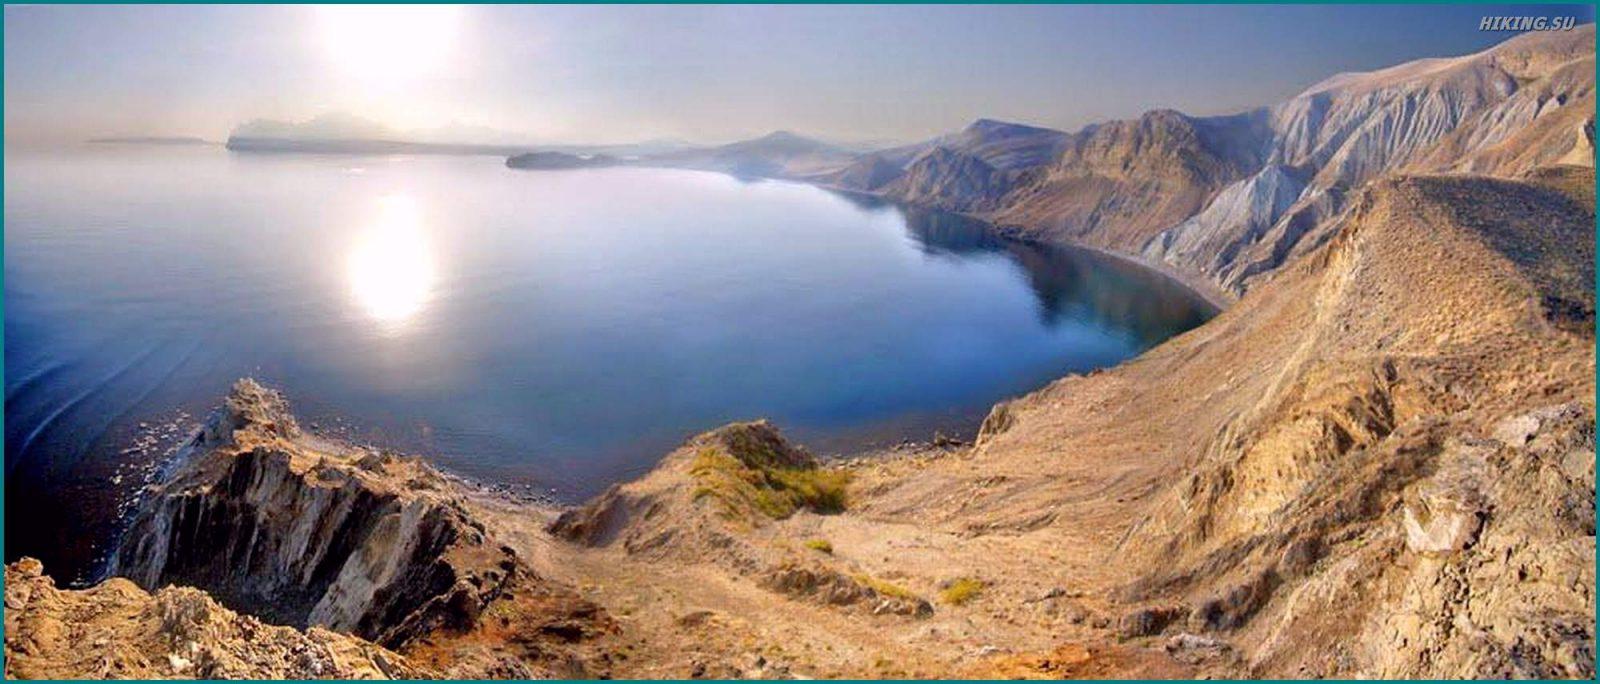 Фото 2 к описанию маршрута Киммерия без Палаток.  и солнце